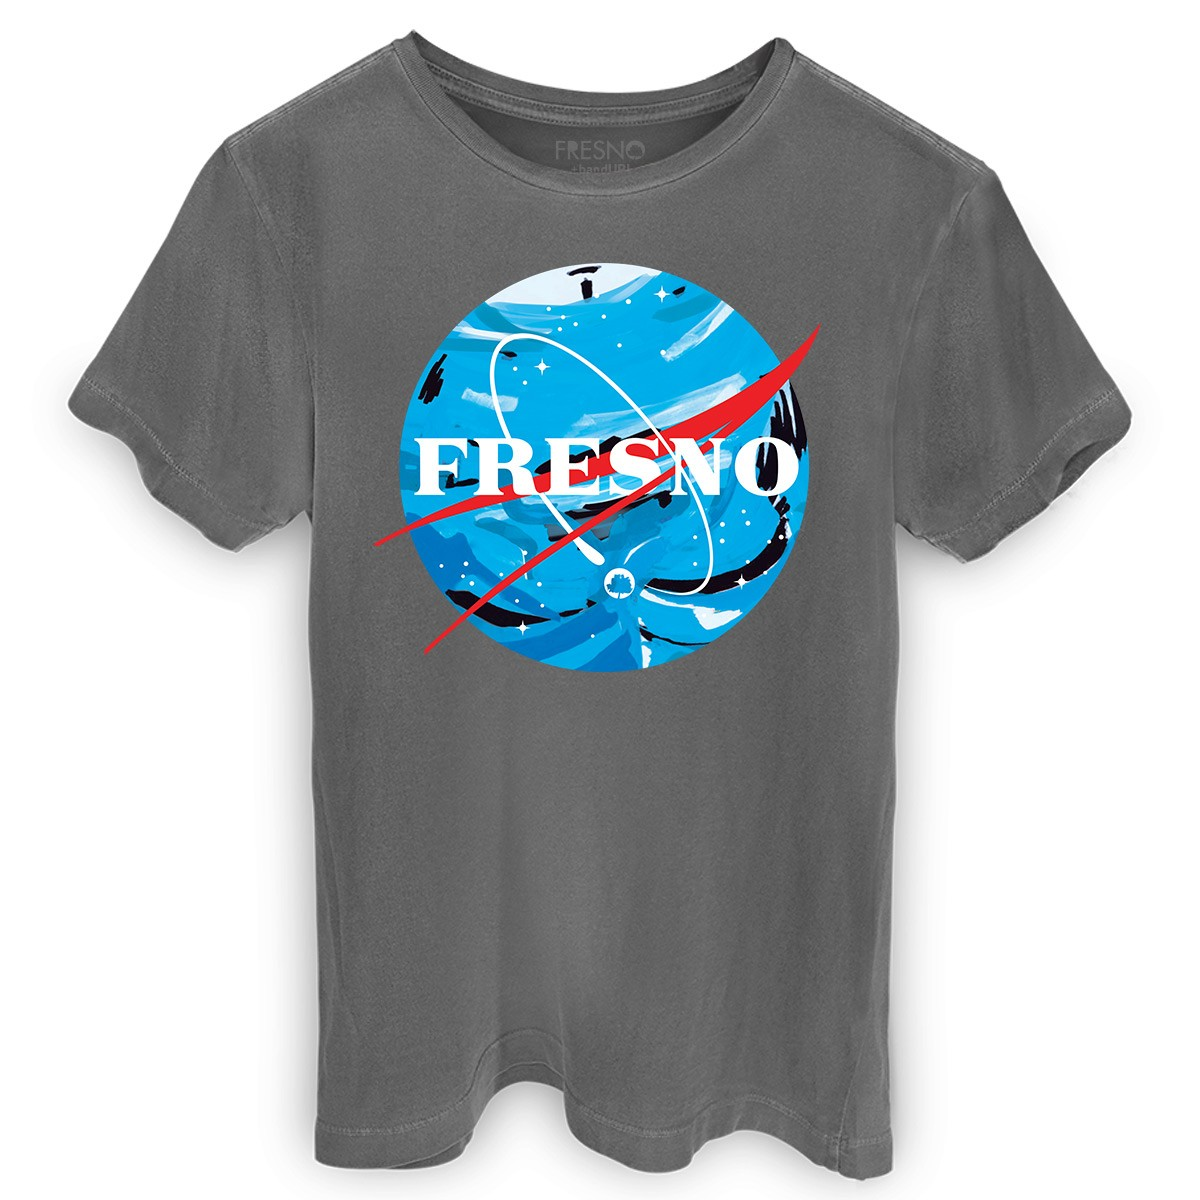 T-Shirt Premium Masculina Fresno Programa Espacial